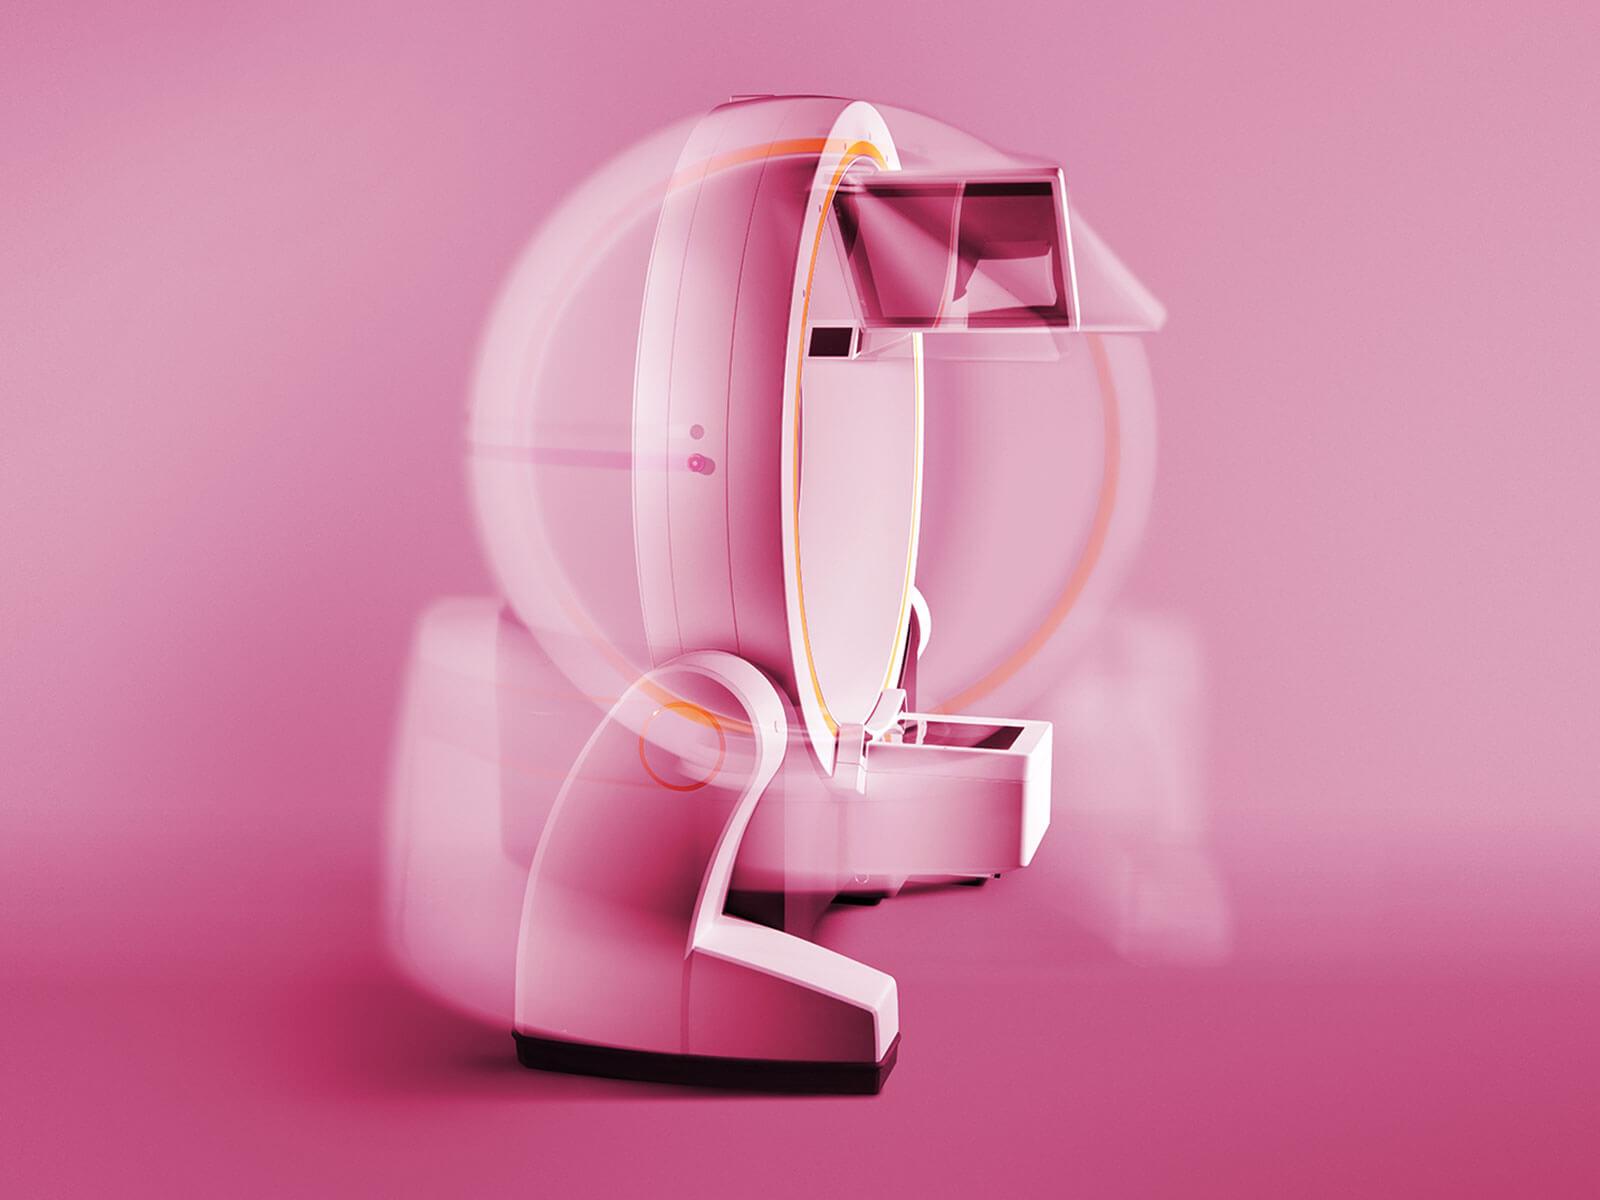 Brainlab Loop-X - Mobile Imtraoperative CT Imaging Robot